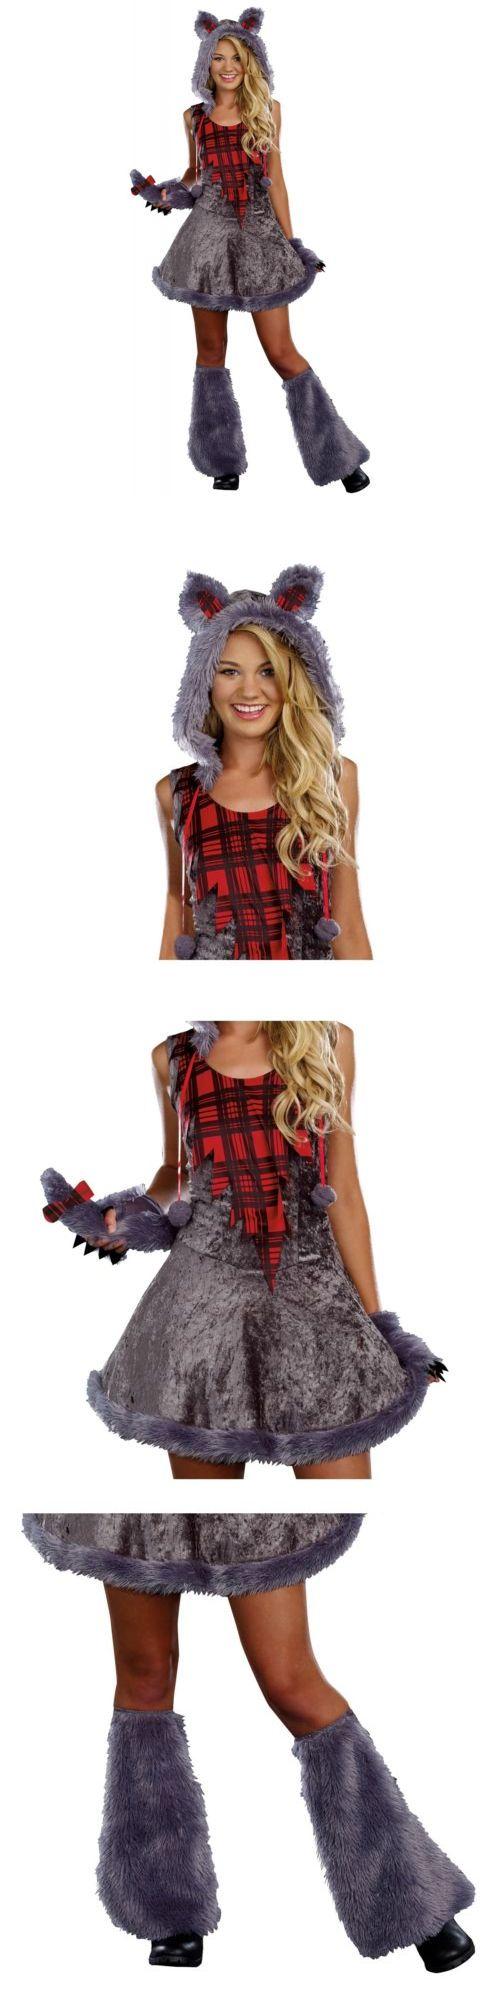 Girls 80914: Werewolf Costume Teen Big Bad Wolf Girls Halloween Fancy Dress -> BUY IT NOW ONLY: $31.09 on eBay!